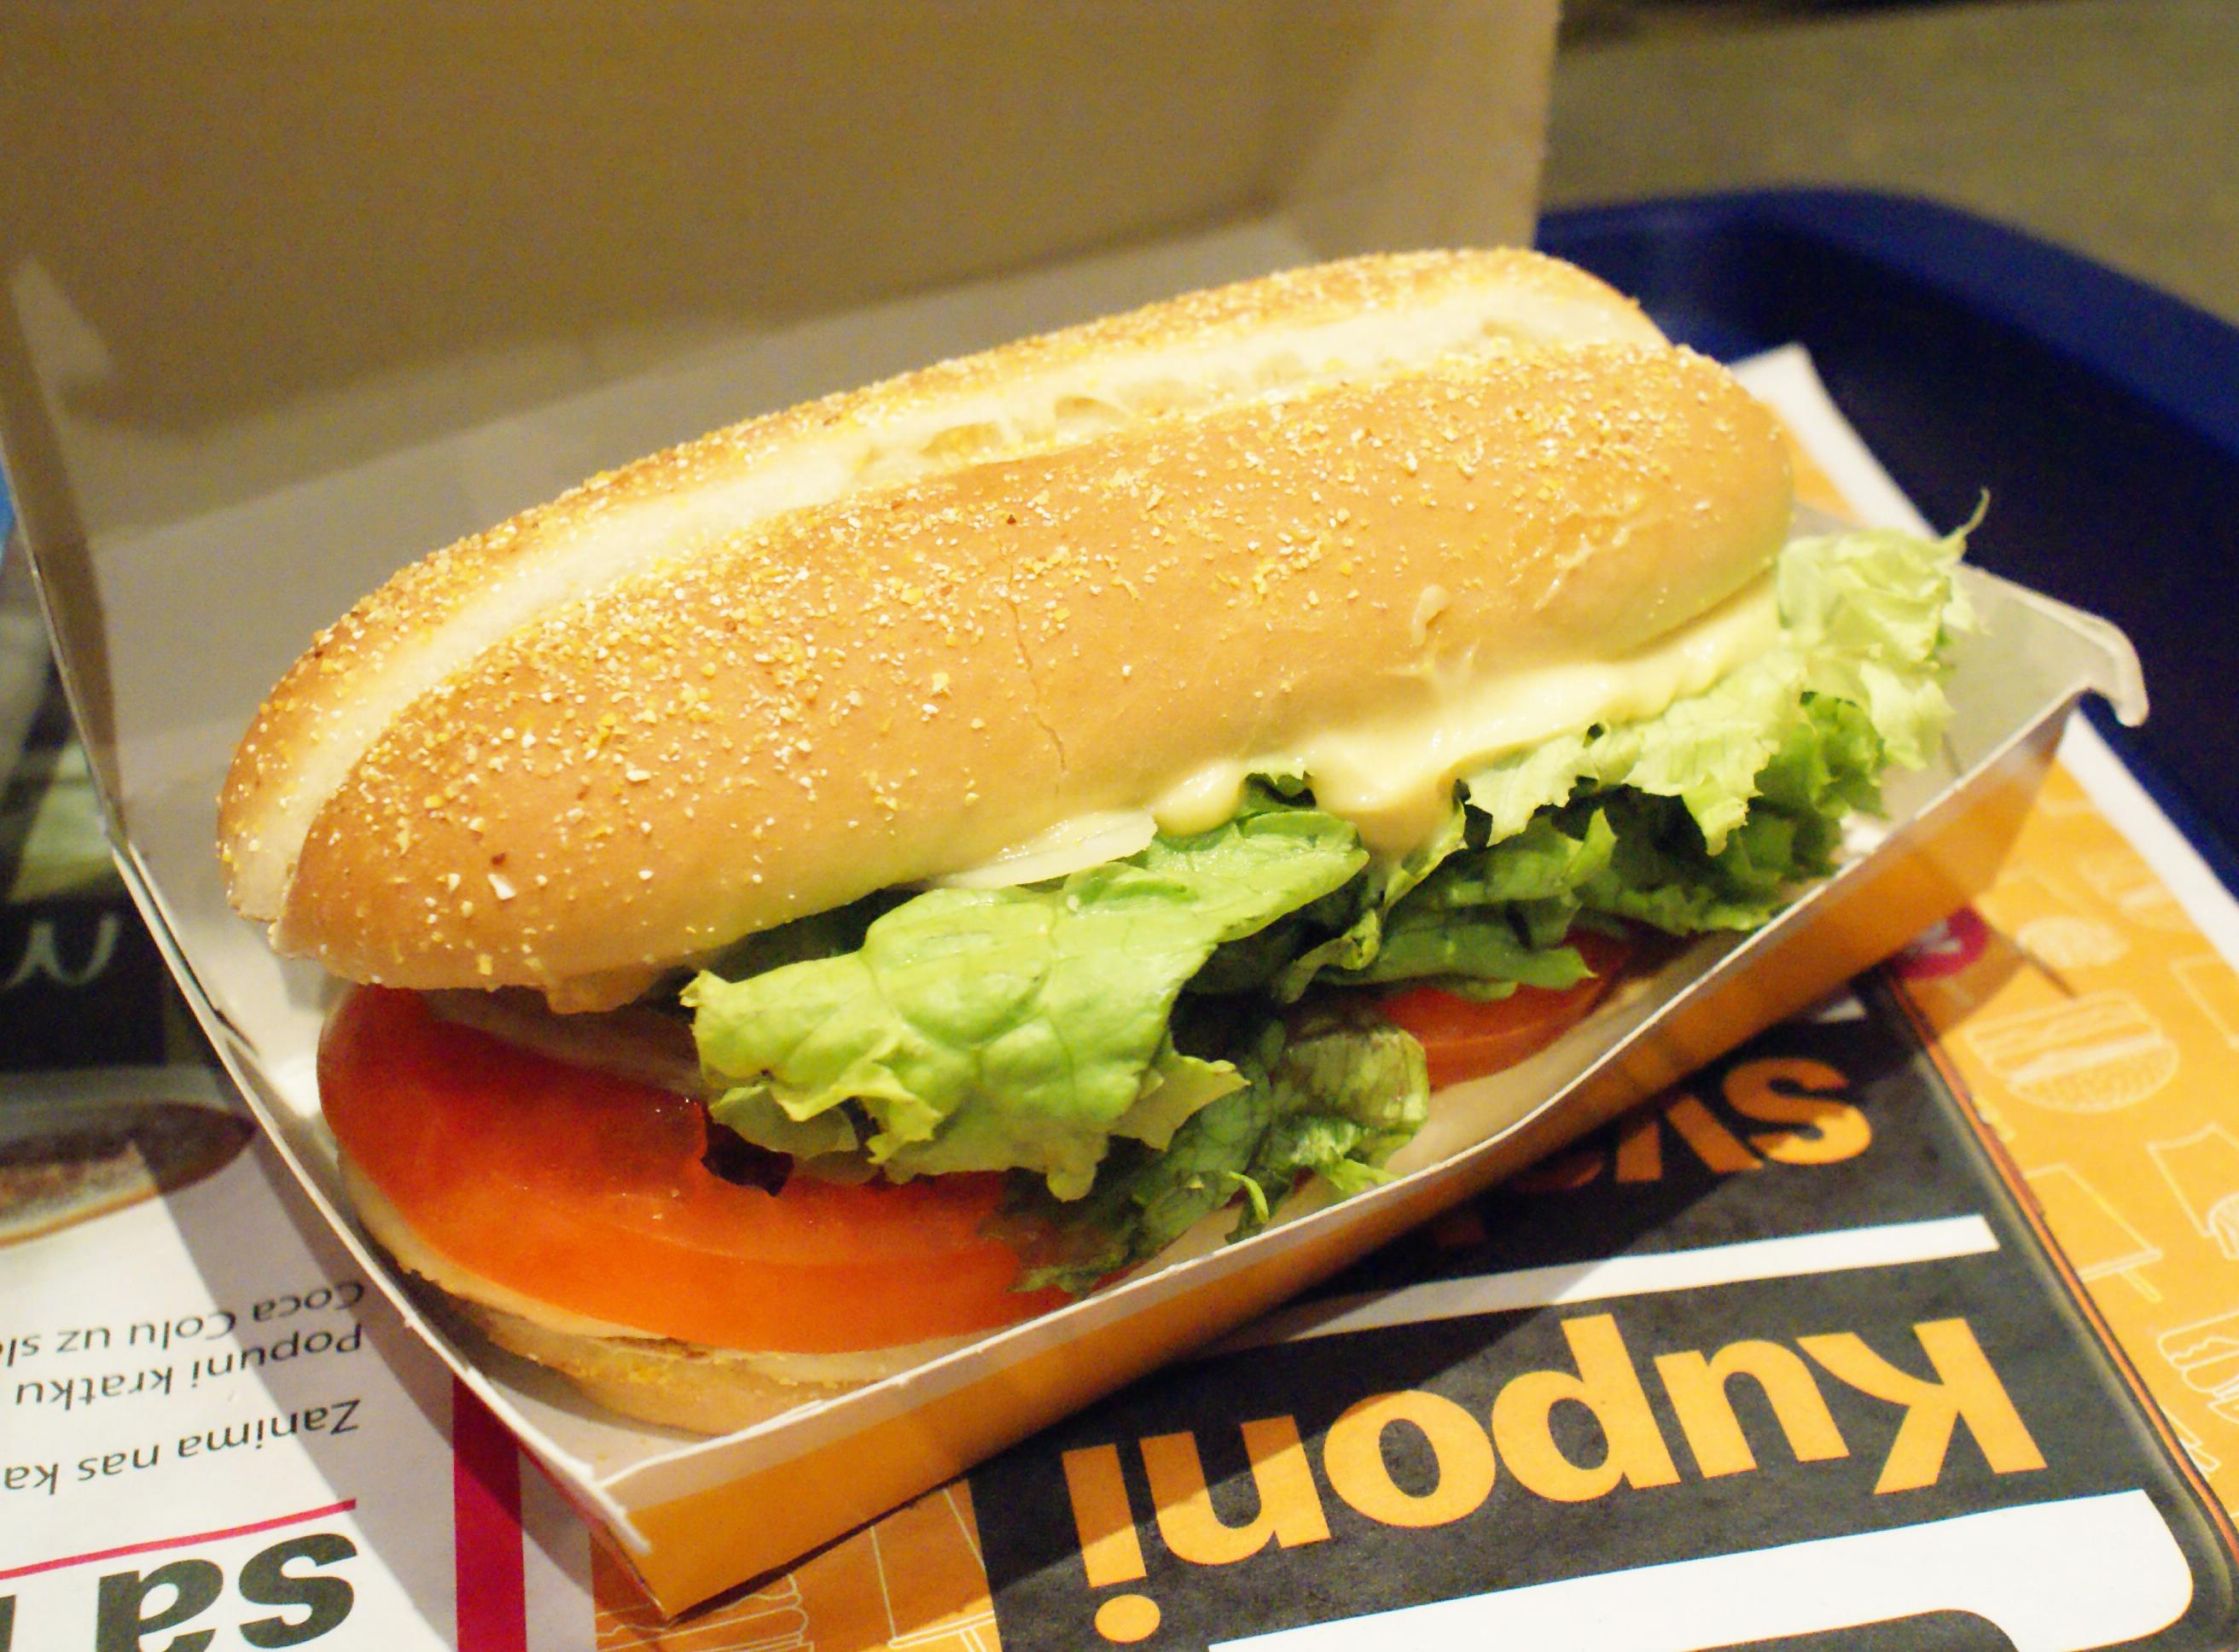 "Serbia_macdonald_chickenburger_001"""""